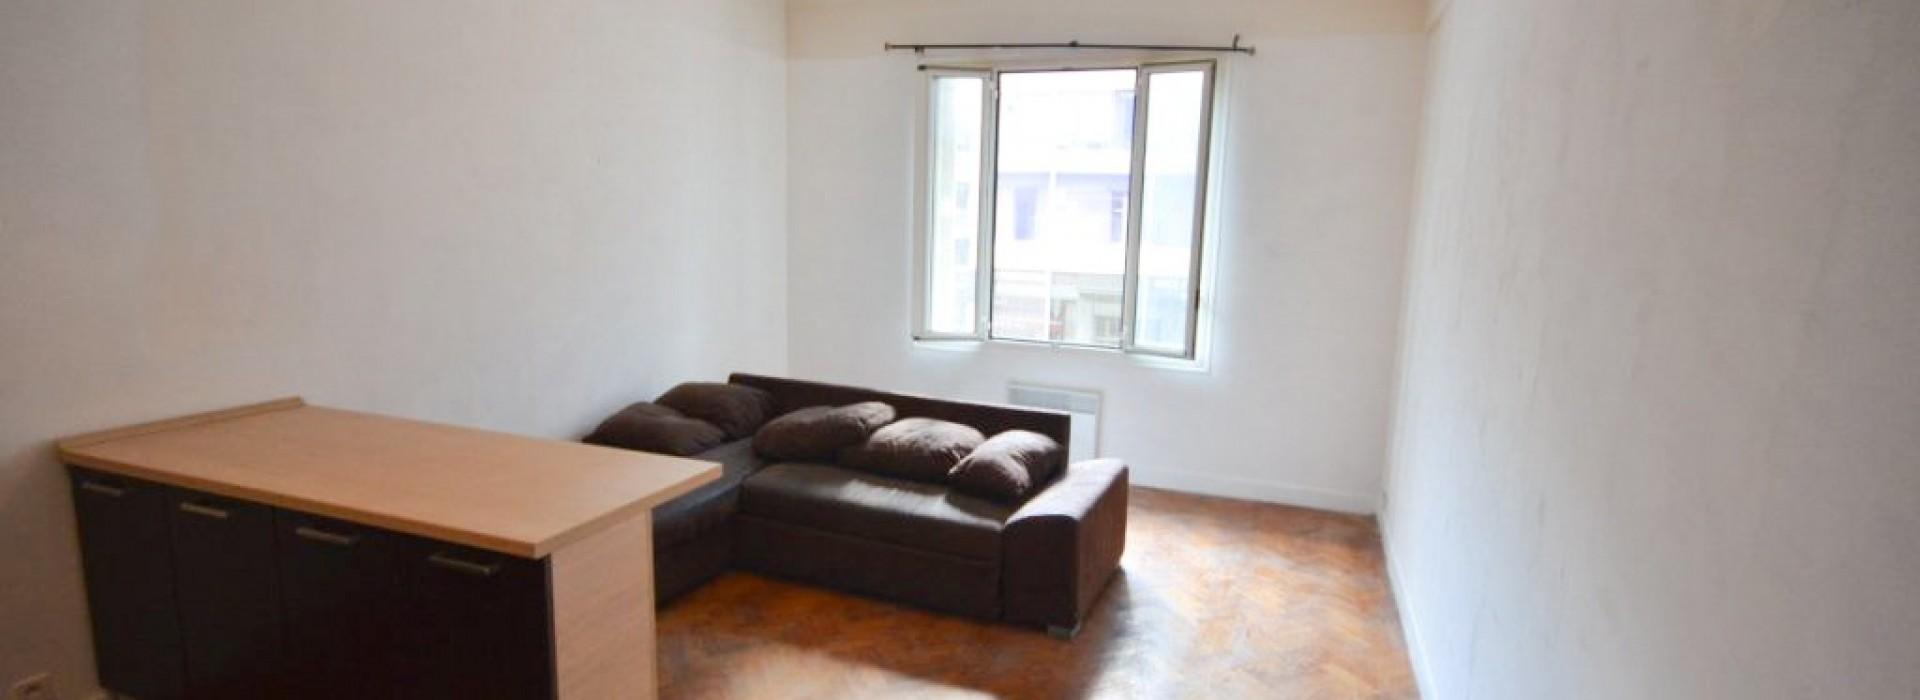 Appartement Nice 1 Pièce 28m2 180,000€